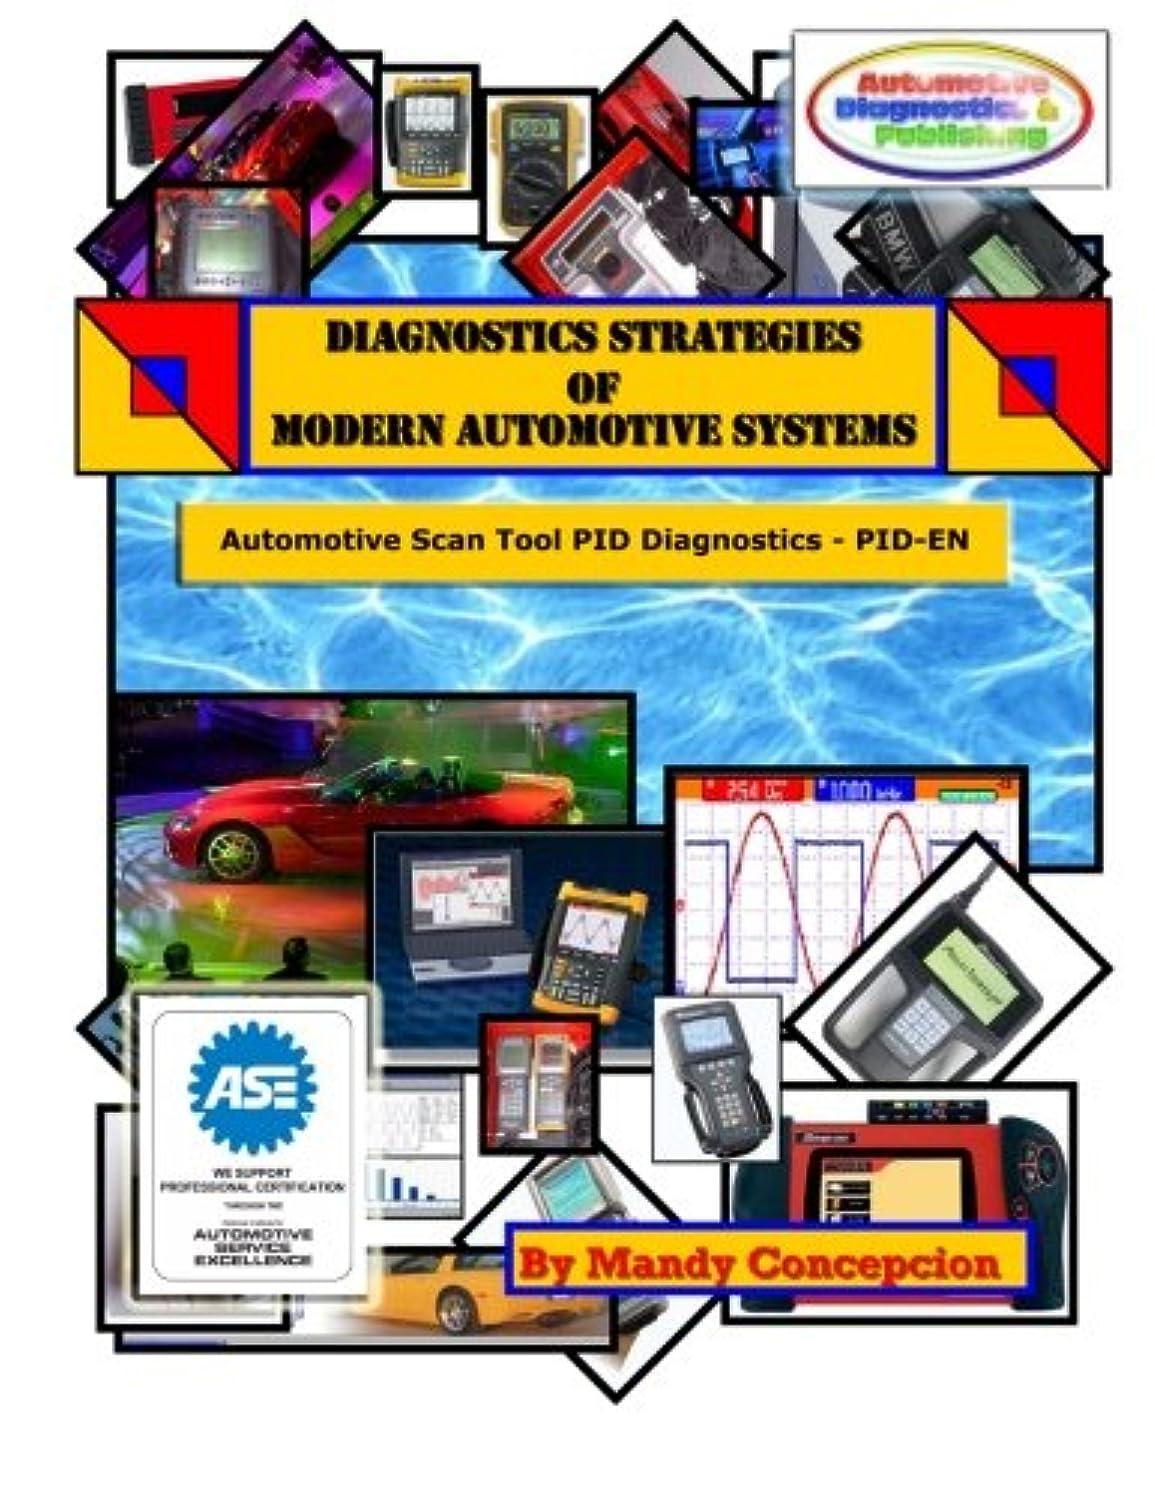 Automotive Scan Tool PID Diagnostics: Diagnostic Strategies of Modern Automotive Systems